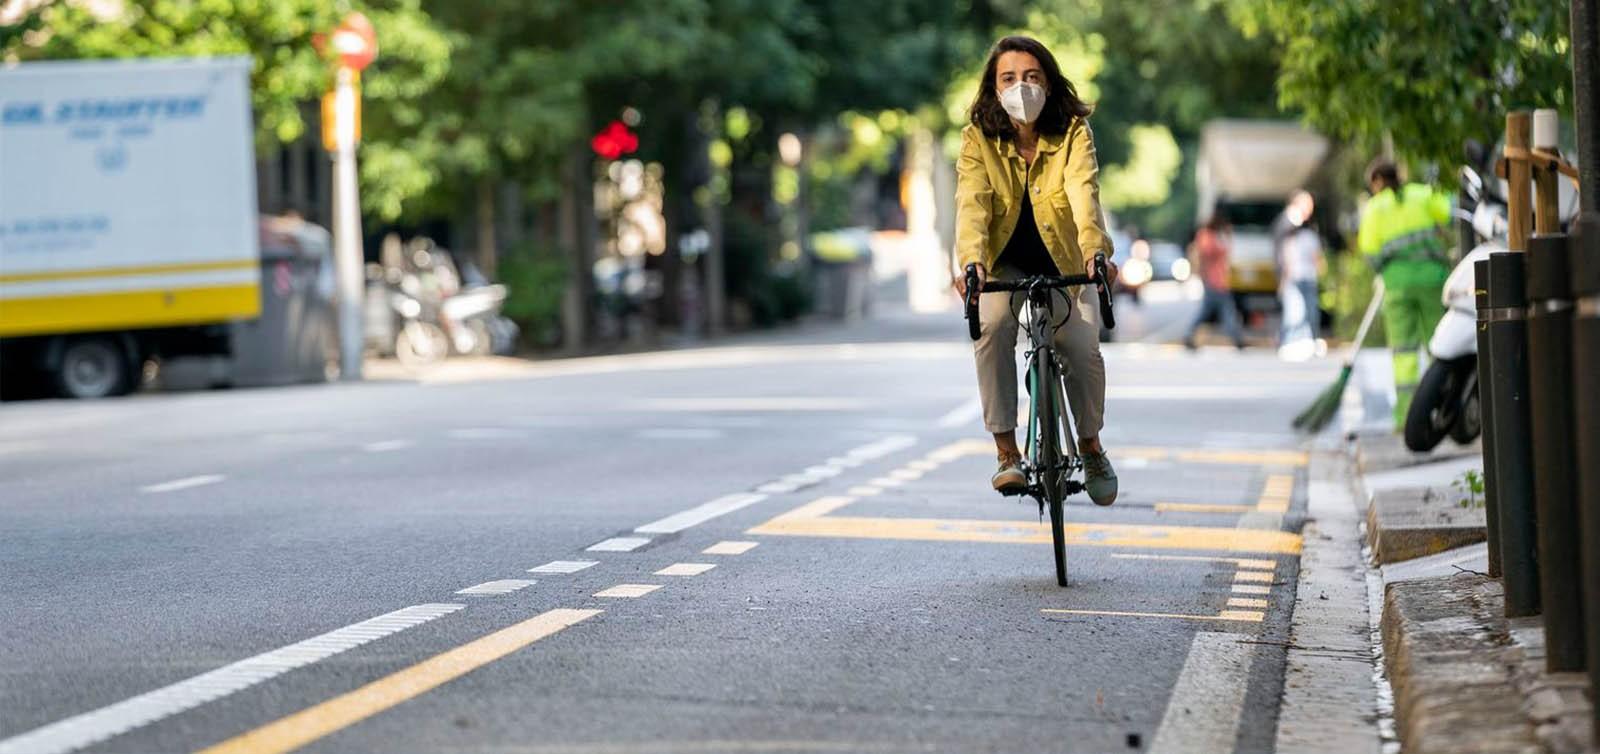 beneficios-ciclismo-covid-19/